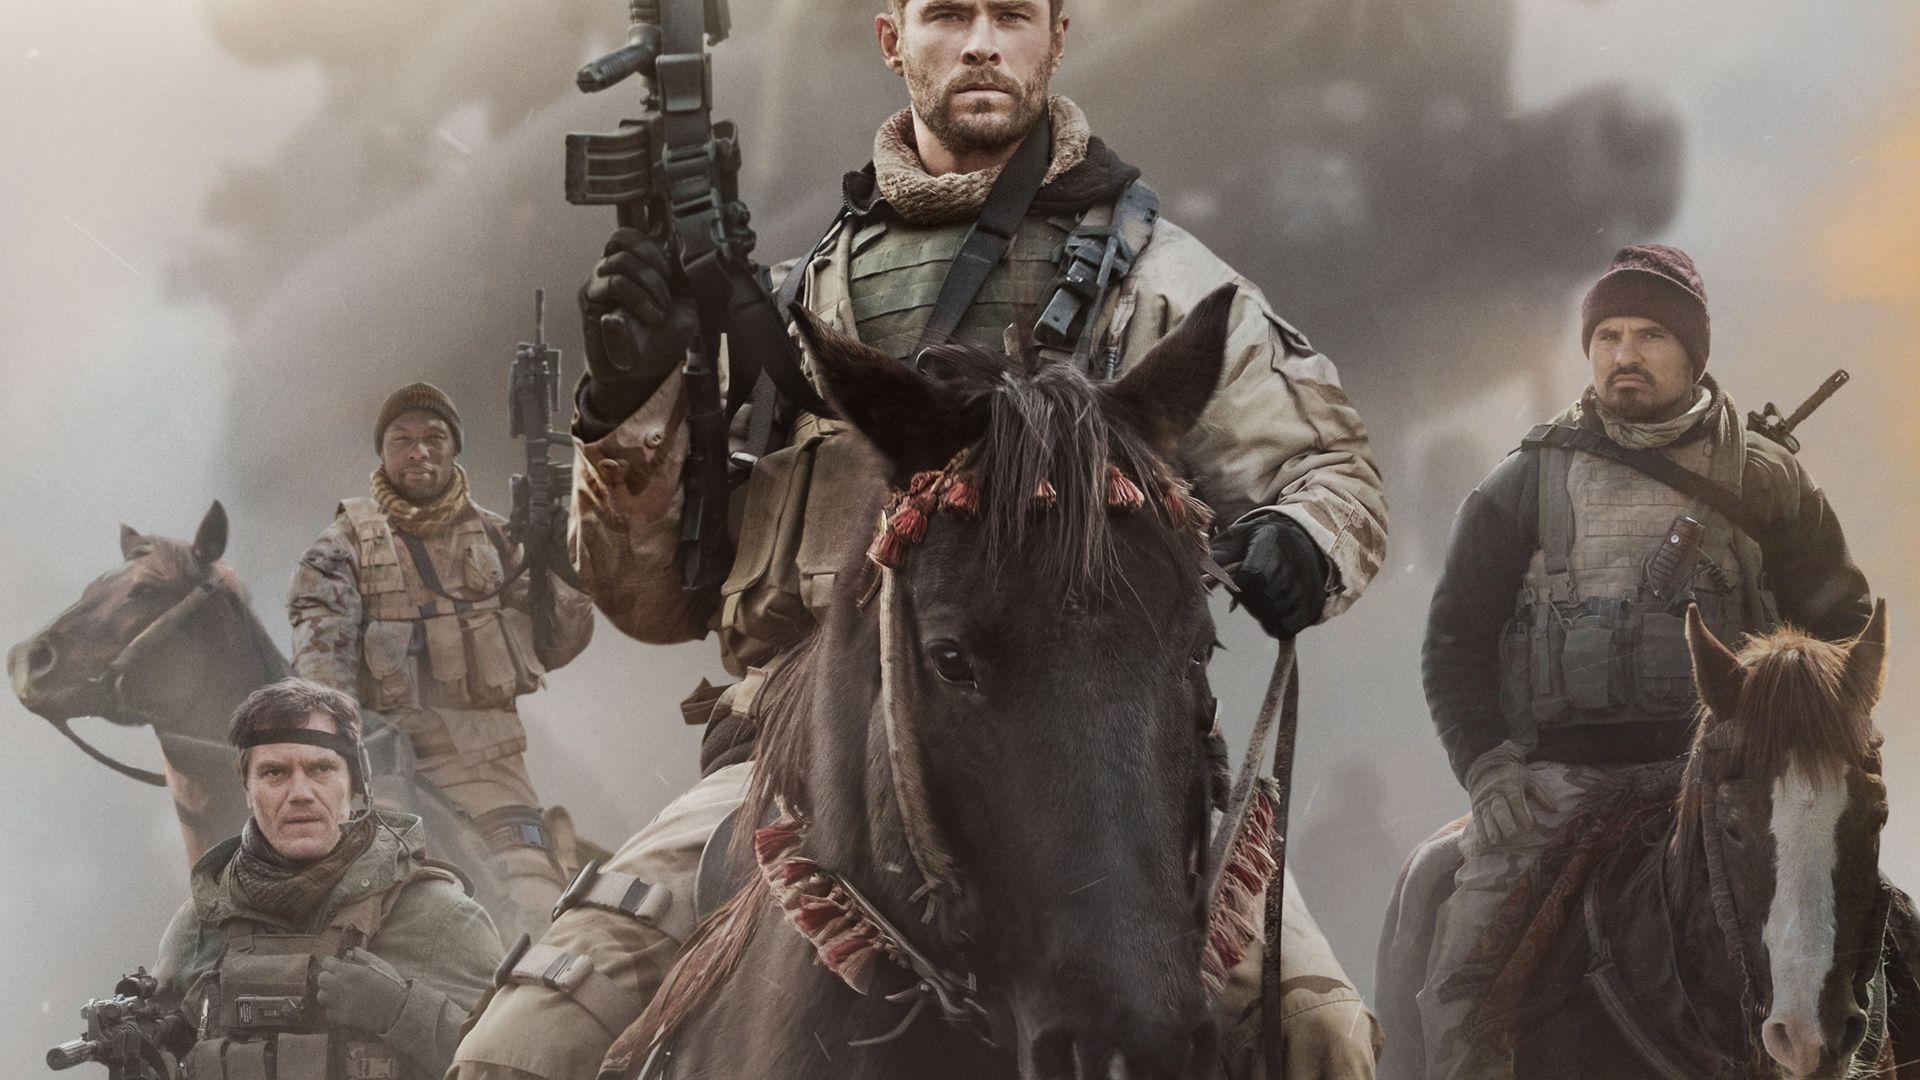 Wallpaper 12 Strong, Chris Hemsworth, 4k, Movies #16293 - 웹